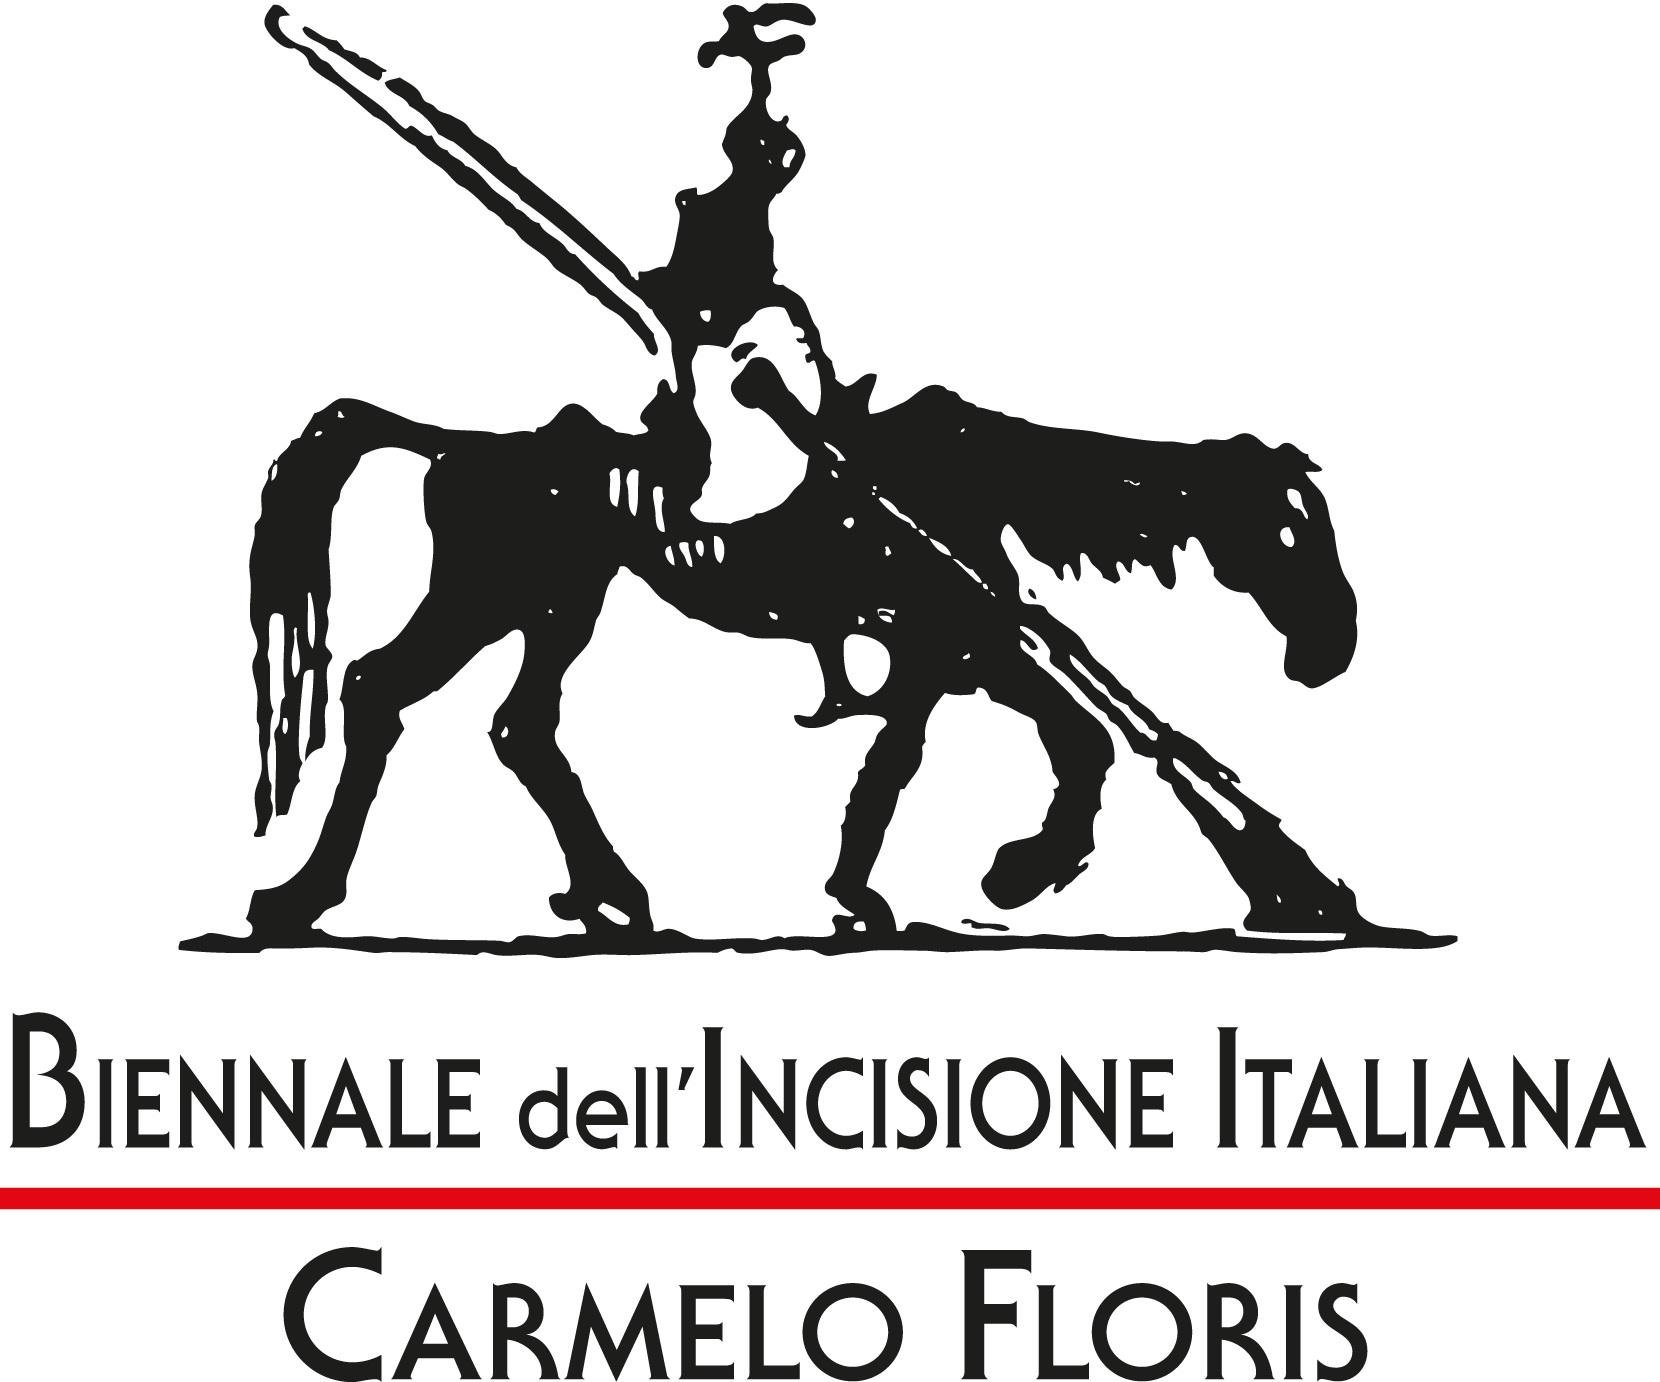 III BIENNALE INCISIONE ITALIANA